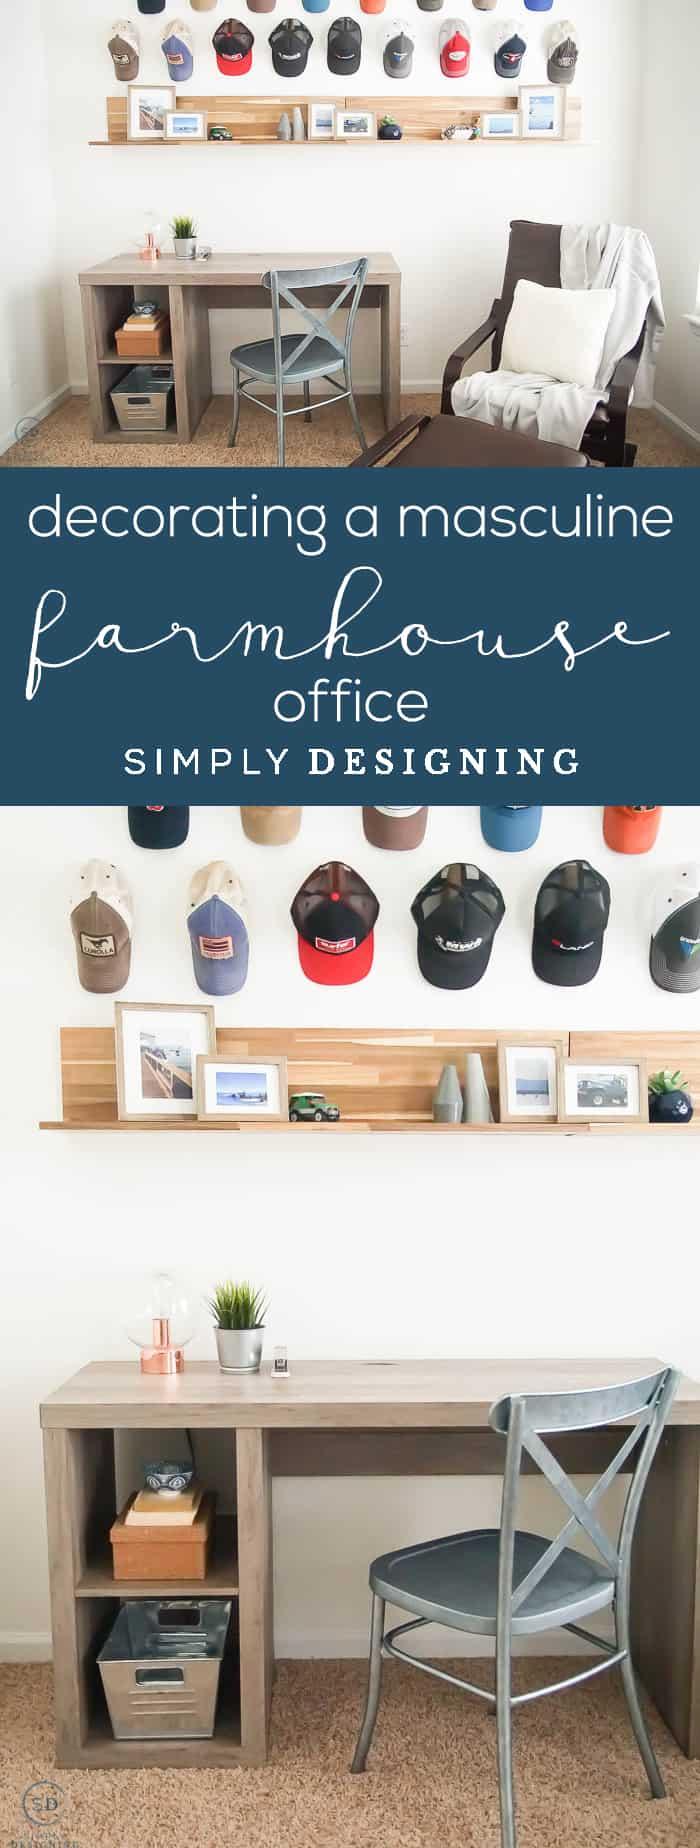 Decorating a masculine Farmhouse Office - mans office - farmhouse design - industrial farmhouse decor - man cave